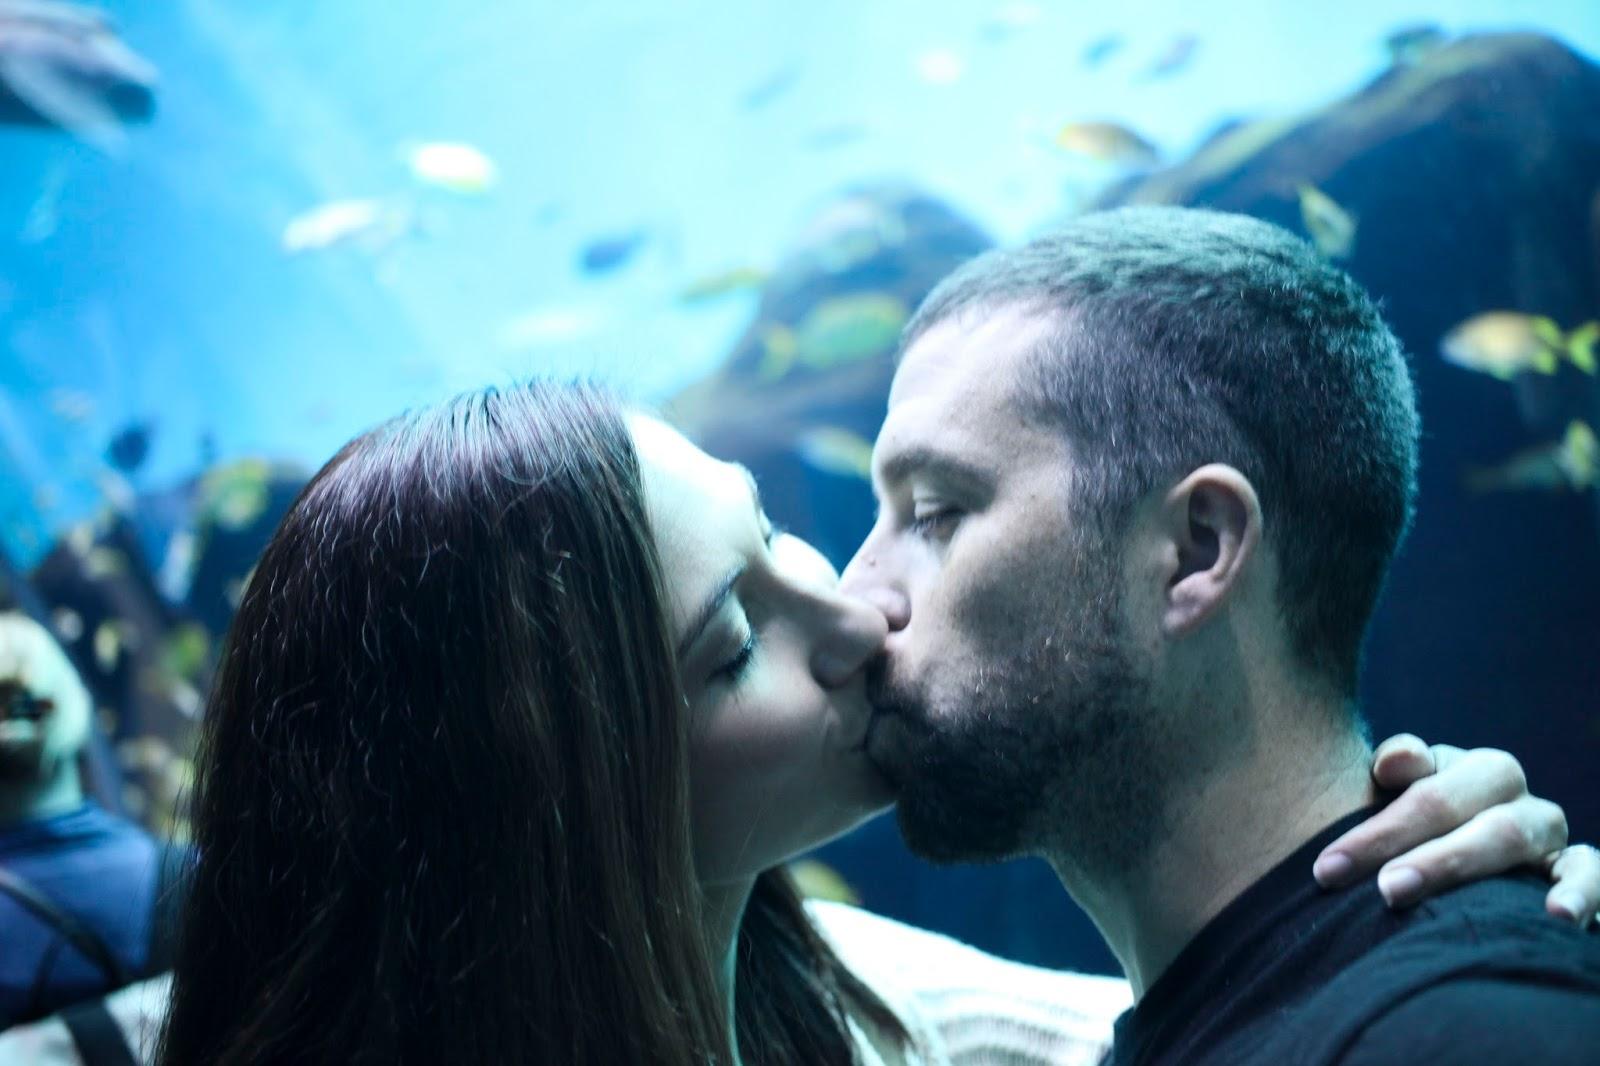 a stolen kiss in an under water world at the Georgia Aquarium